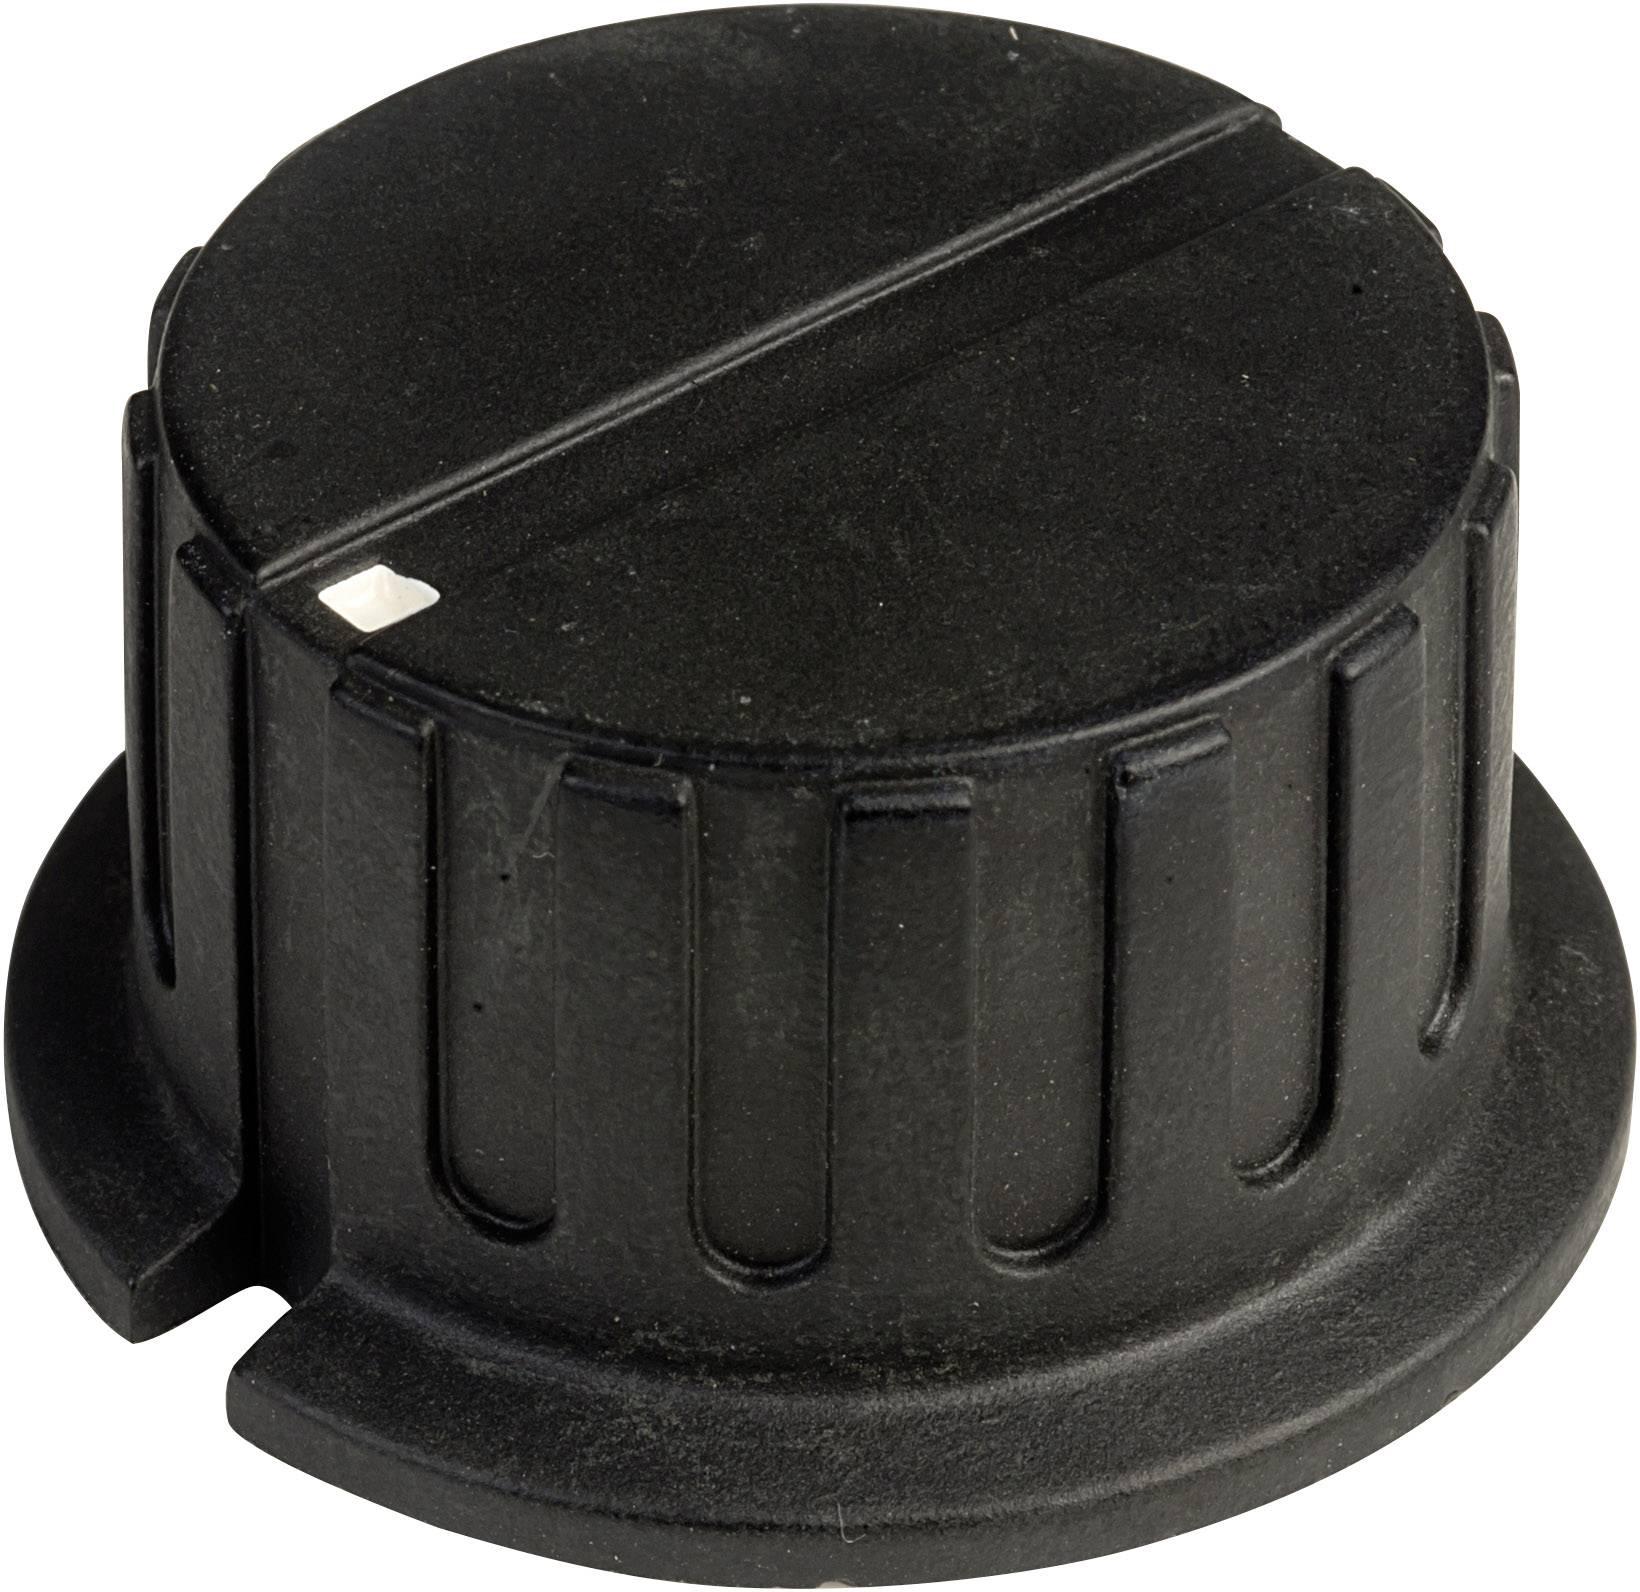 Otočný gombík SCI PN-38A(6.4mm), (Ø x v) 34.8 mm x 18 mm, čierna, 1 ks